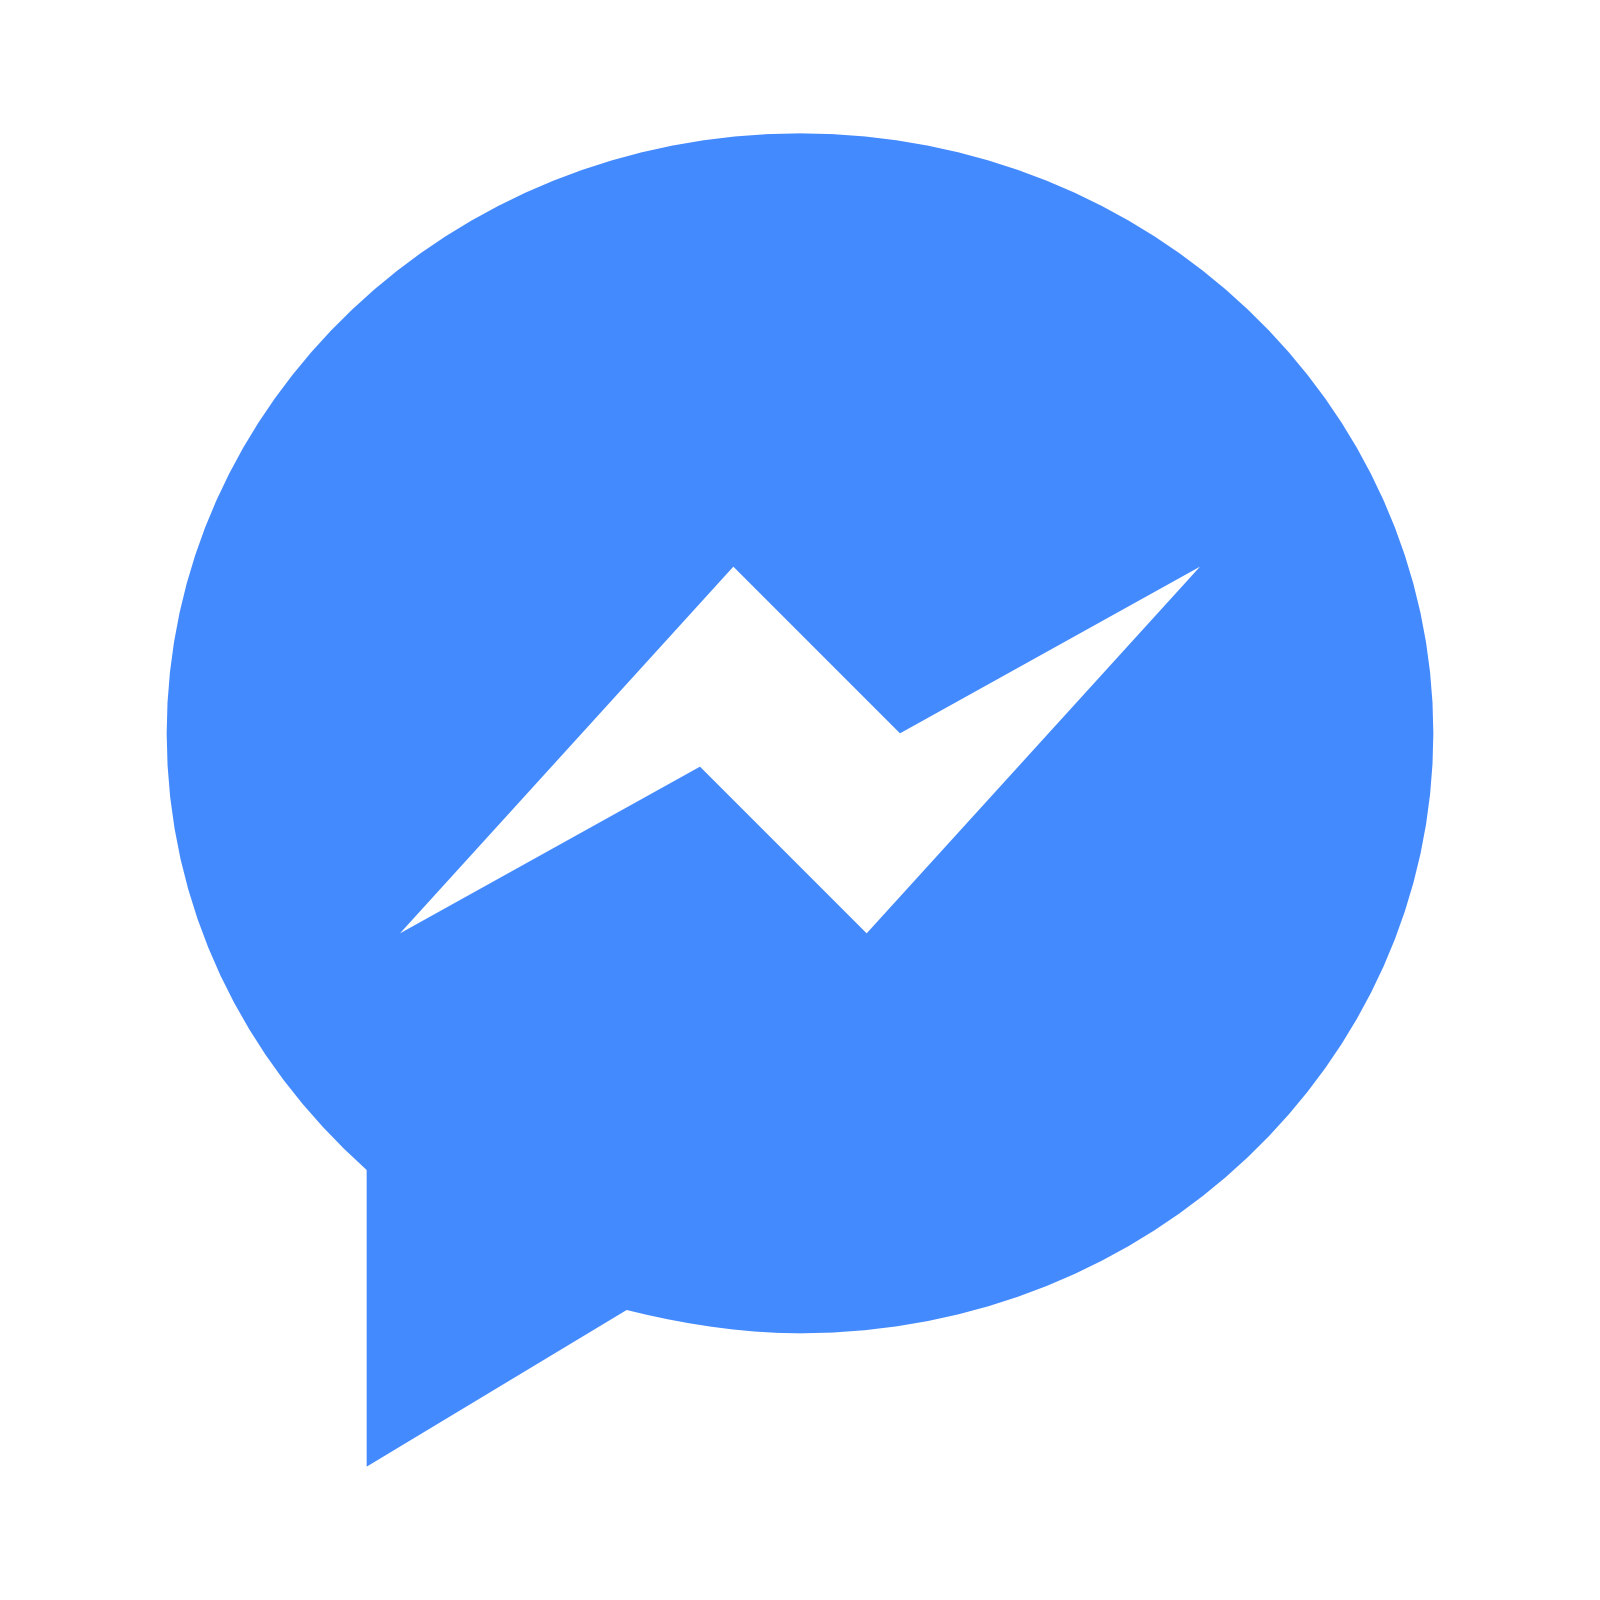 Download Facebook Icons Media Computer Messenger Chat Social.